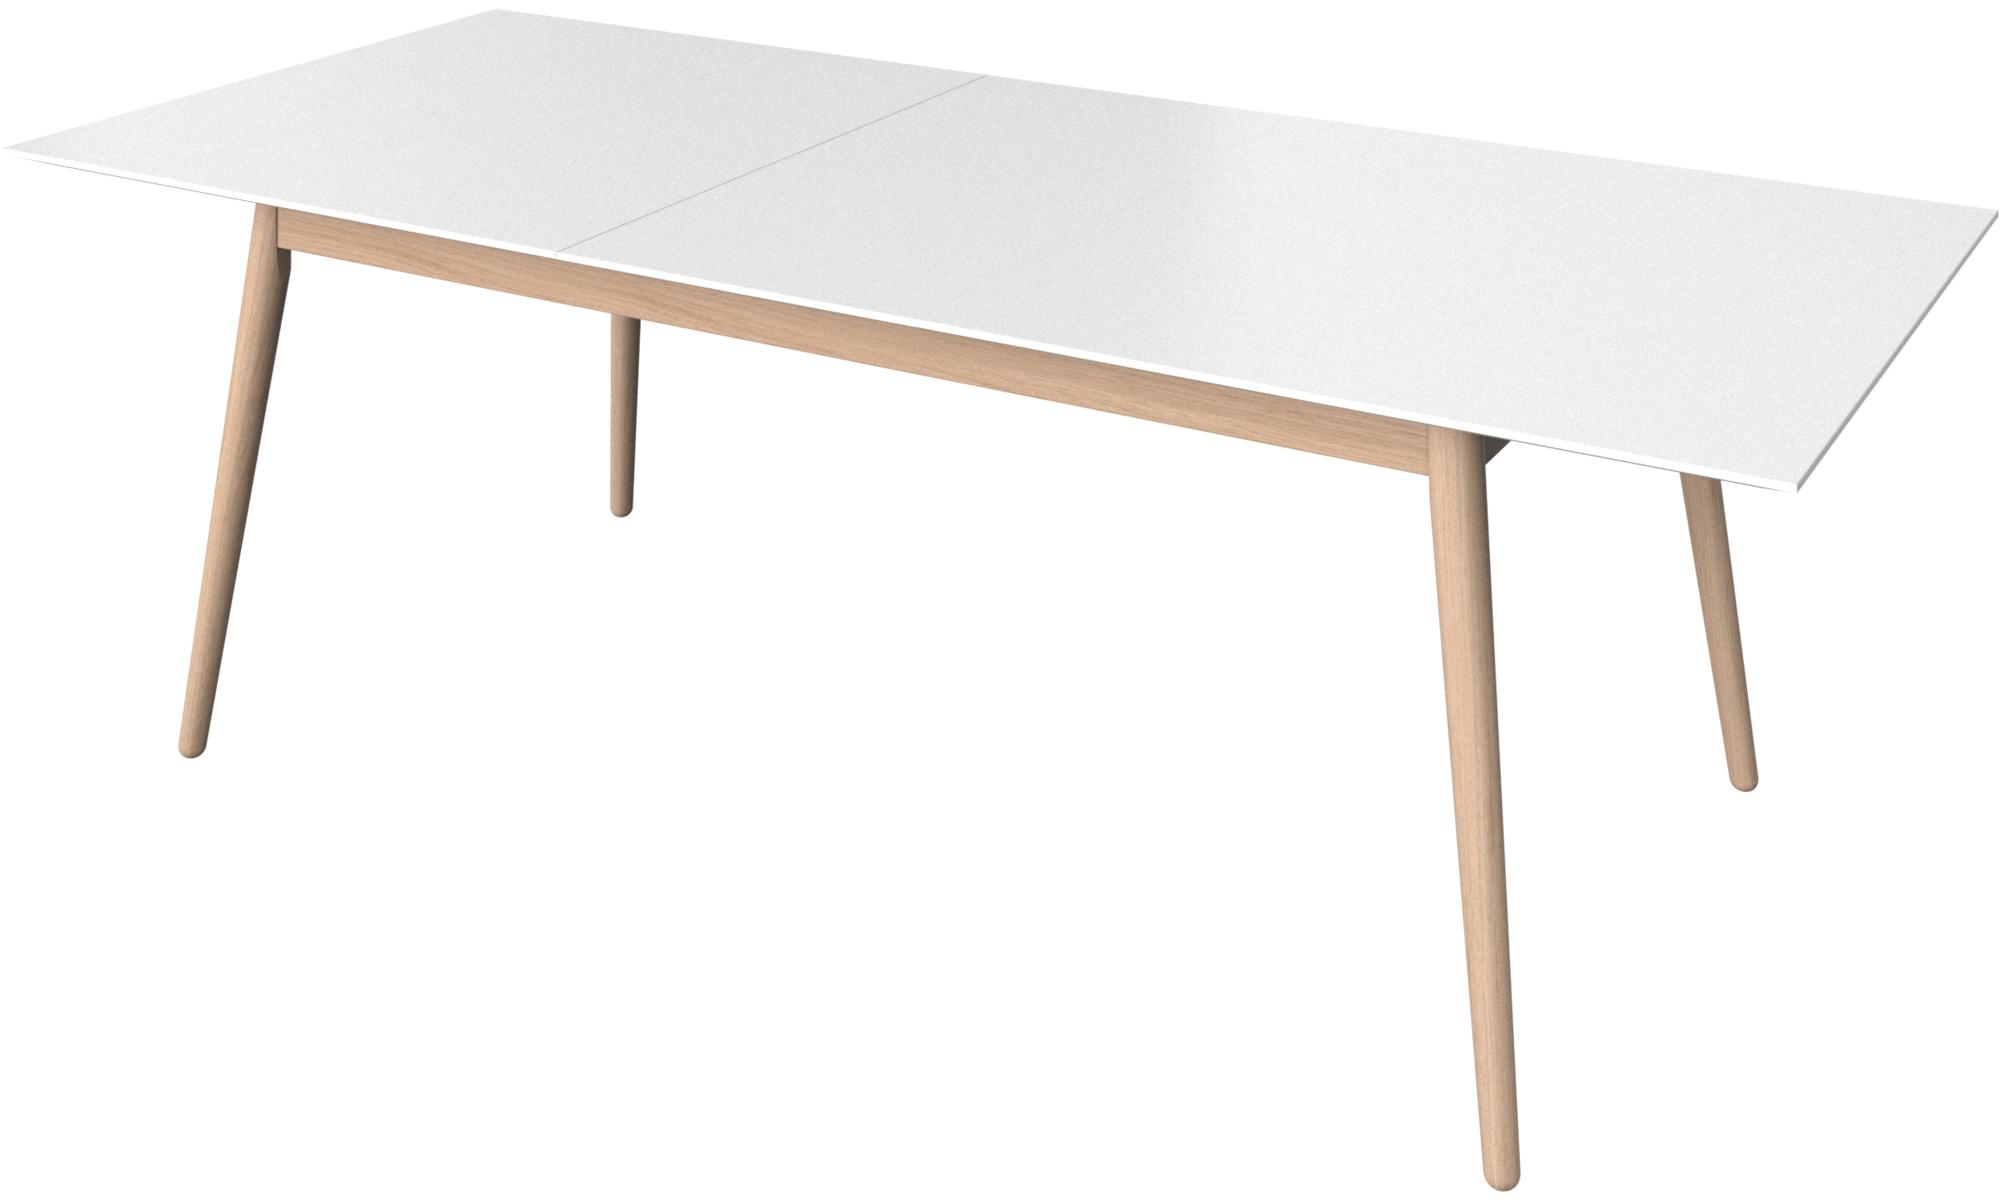 Tables de salle 224 manger table Milano avec rallonge  : 367734 from www.boconcept.com size 2000 x 1200 jpeg 87kB